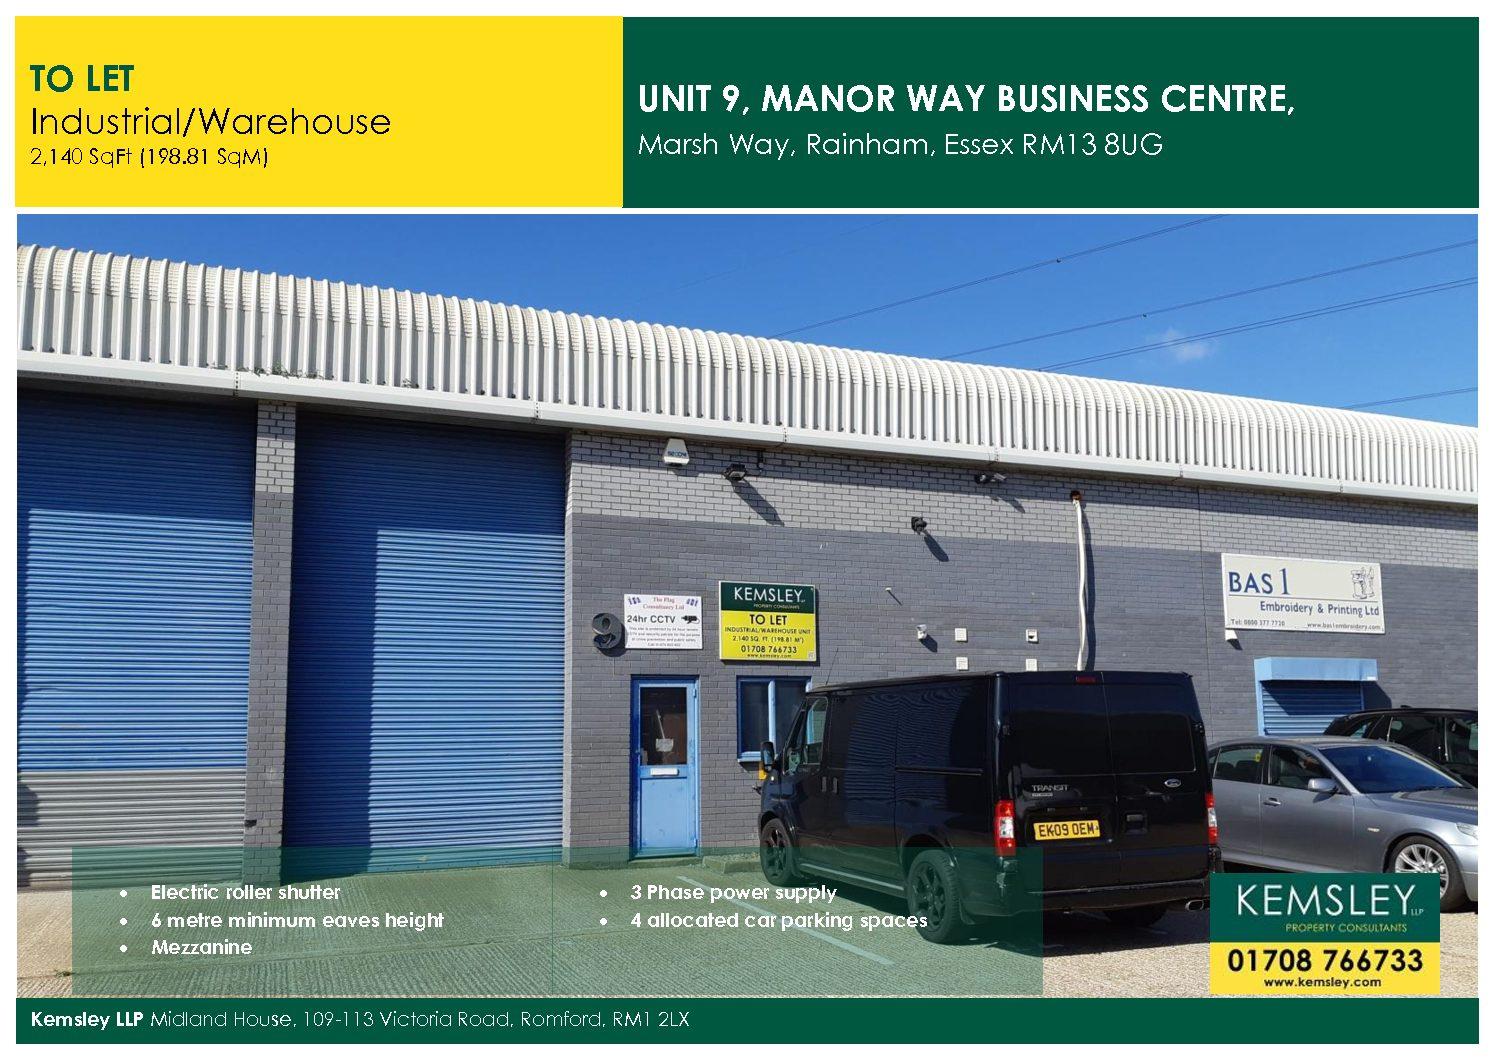 Unit 9, Manor Way Business Centre, Marsh Way, Rainham Essex RM13 8UG